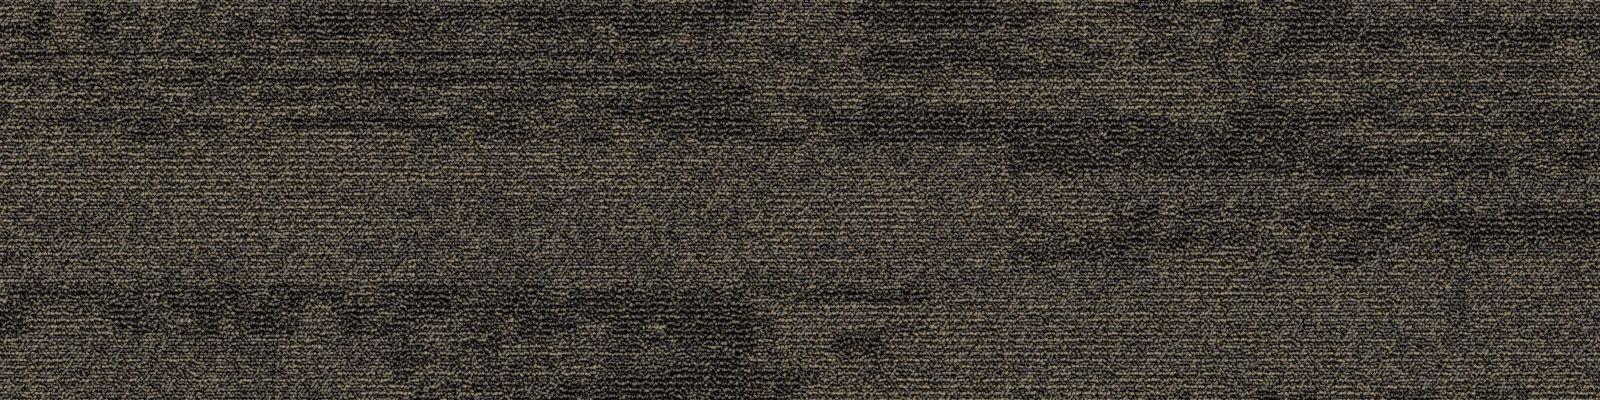 thảm skywalk 03